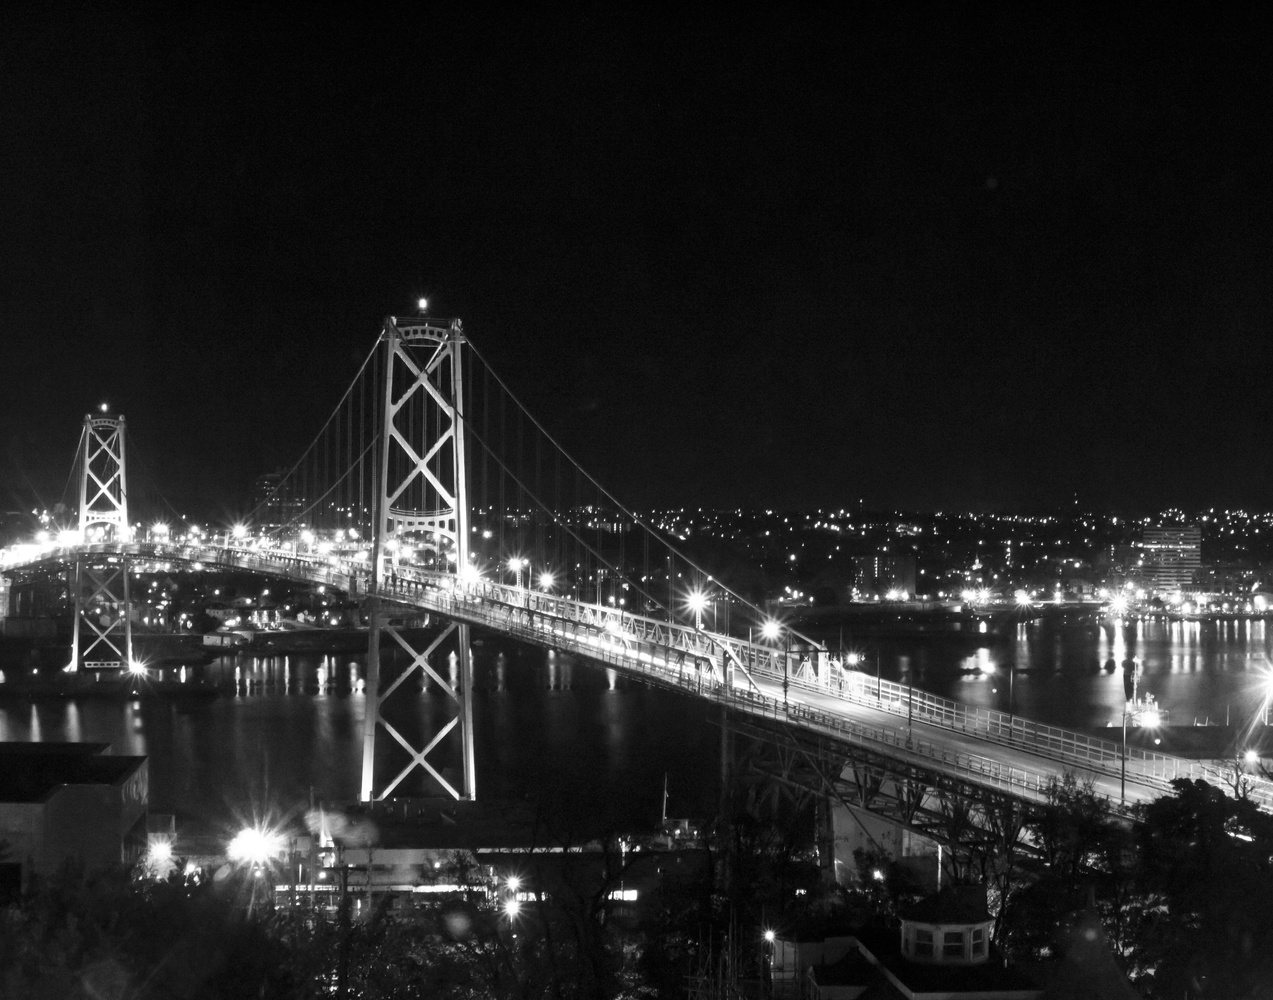 MacDonald Bridge In Halifax by James Jewers